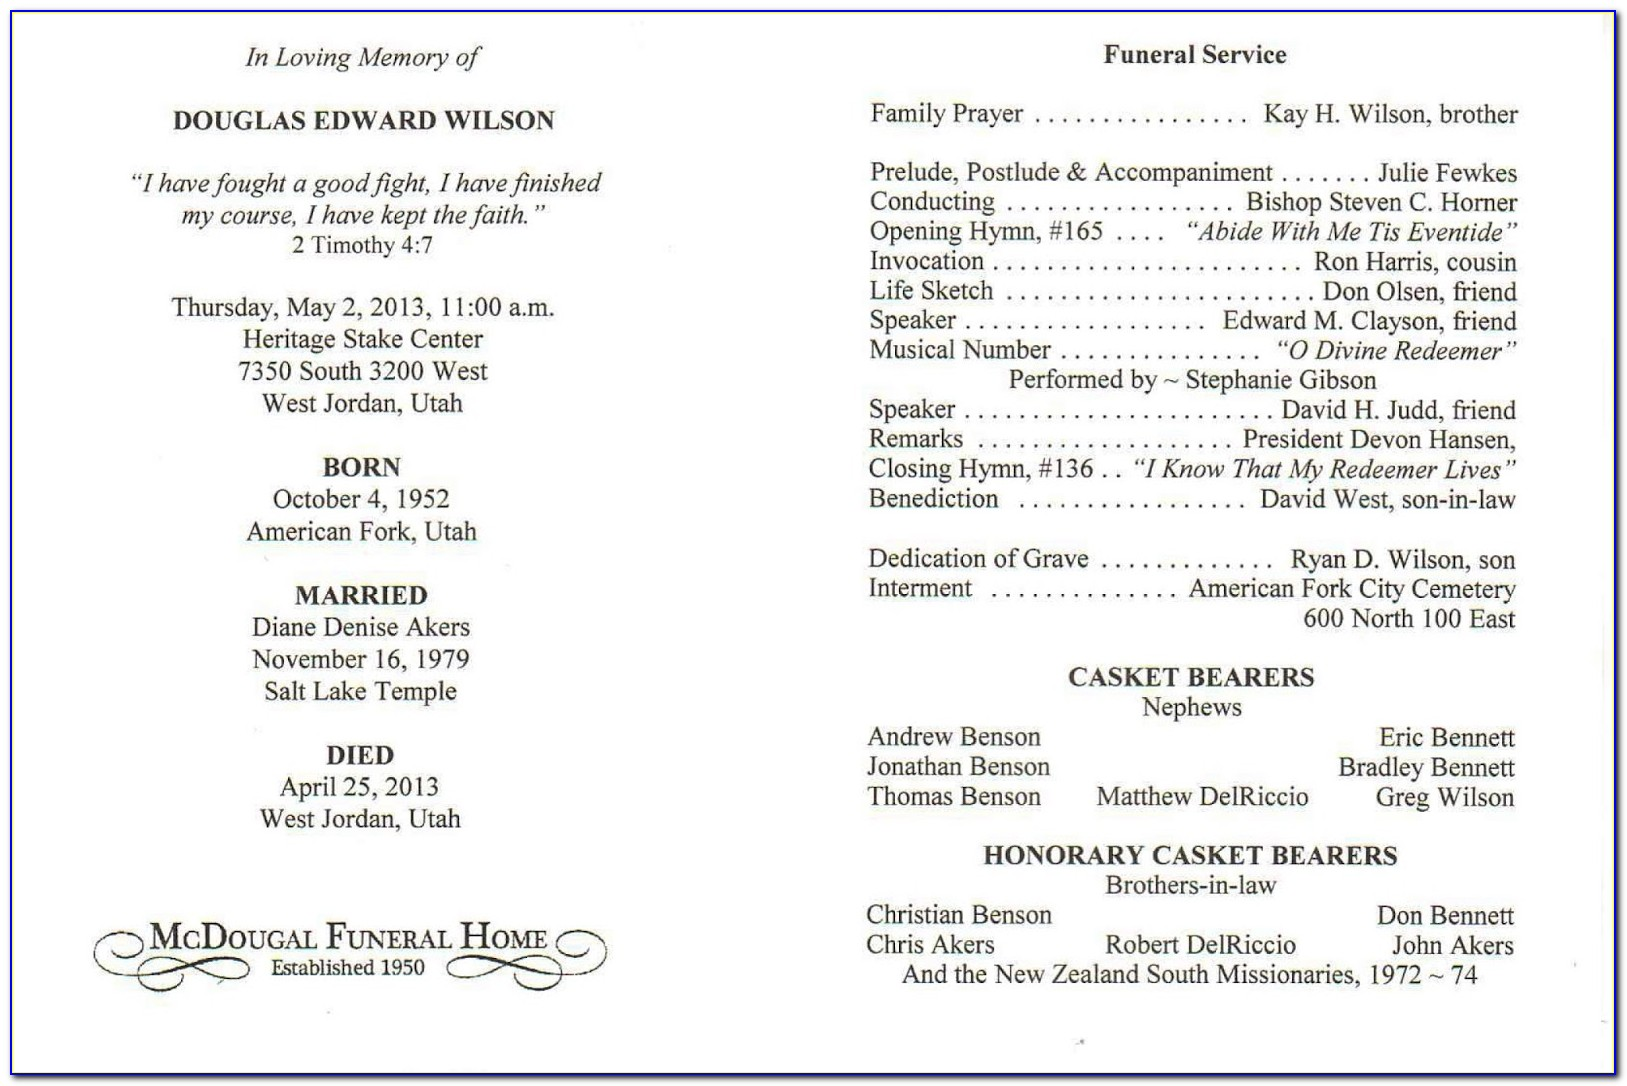 Funeral Service Brochure Templates